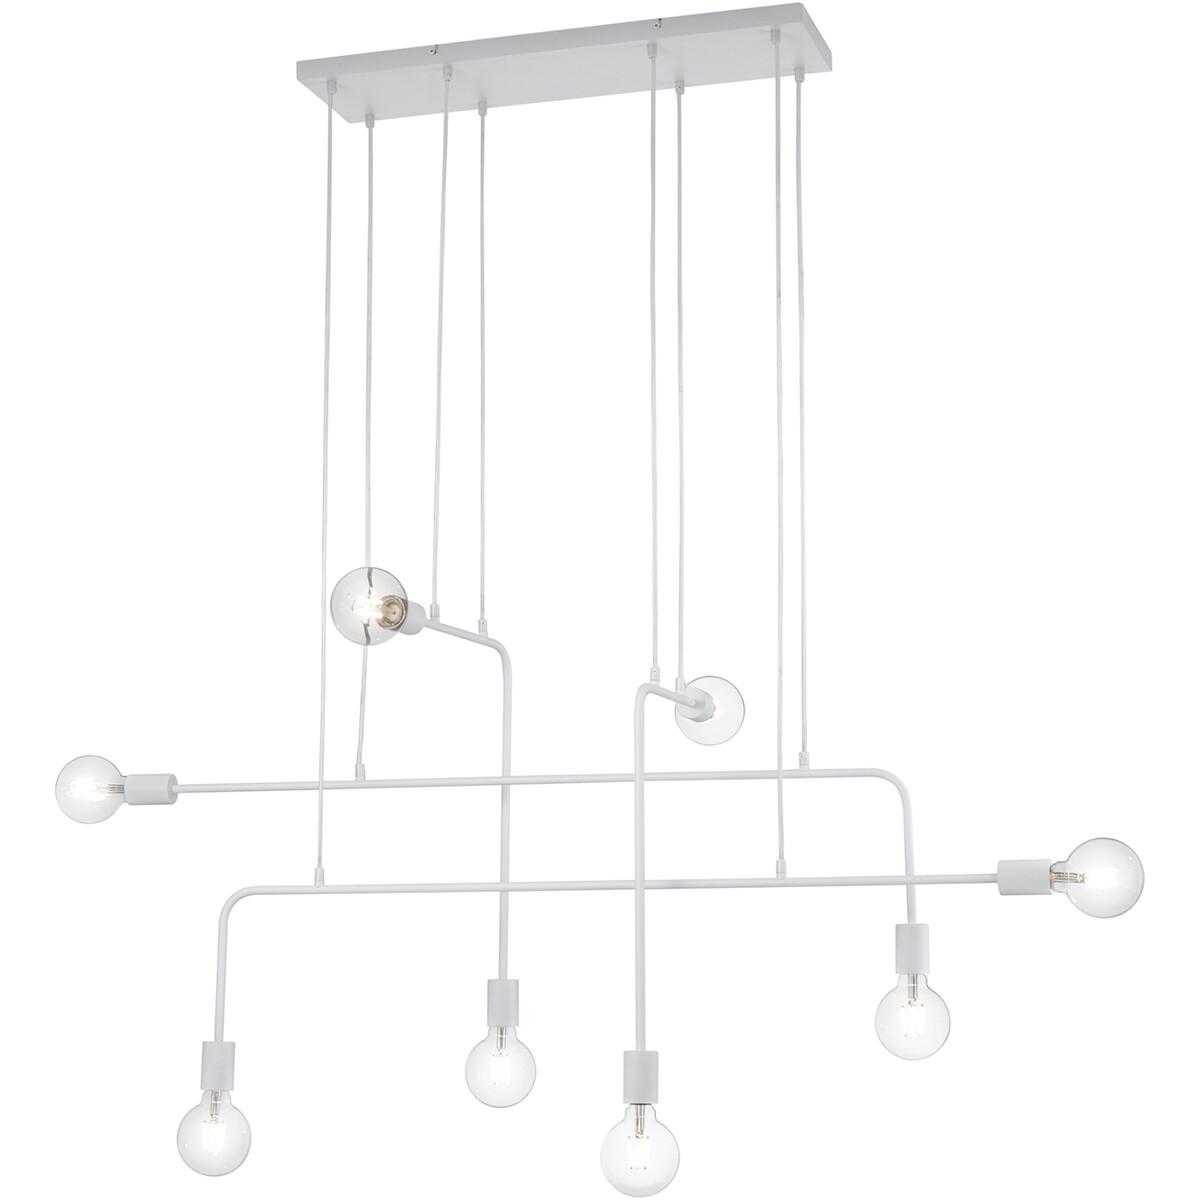 LED Hanglamp - Trion Conar - E27 Fitting - Rechthoek - Mat Wit - Aluminium